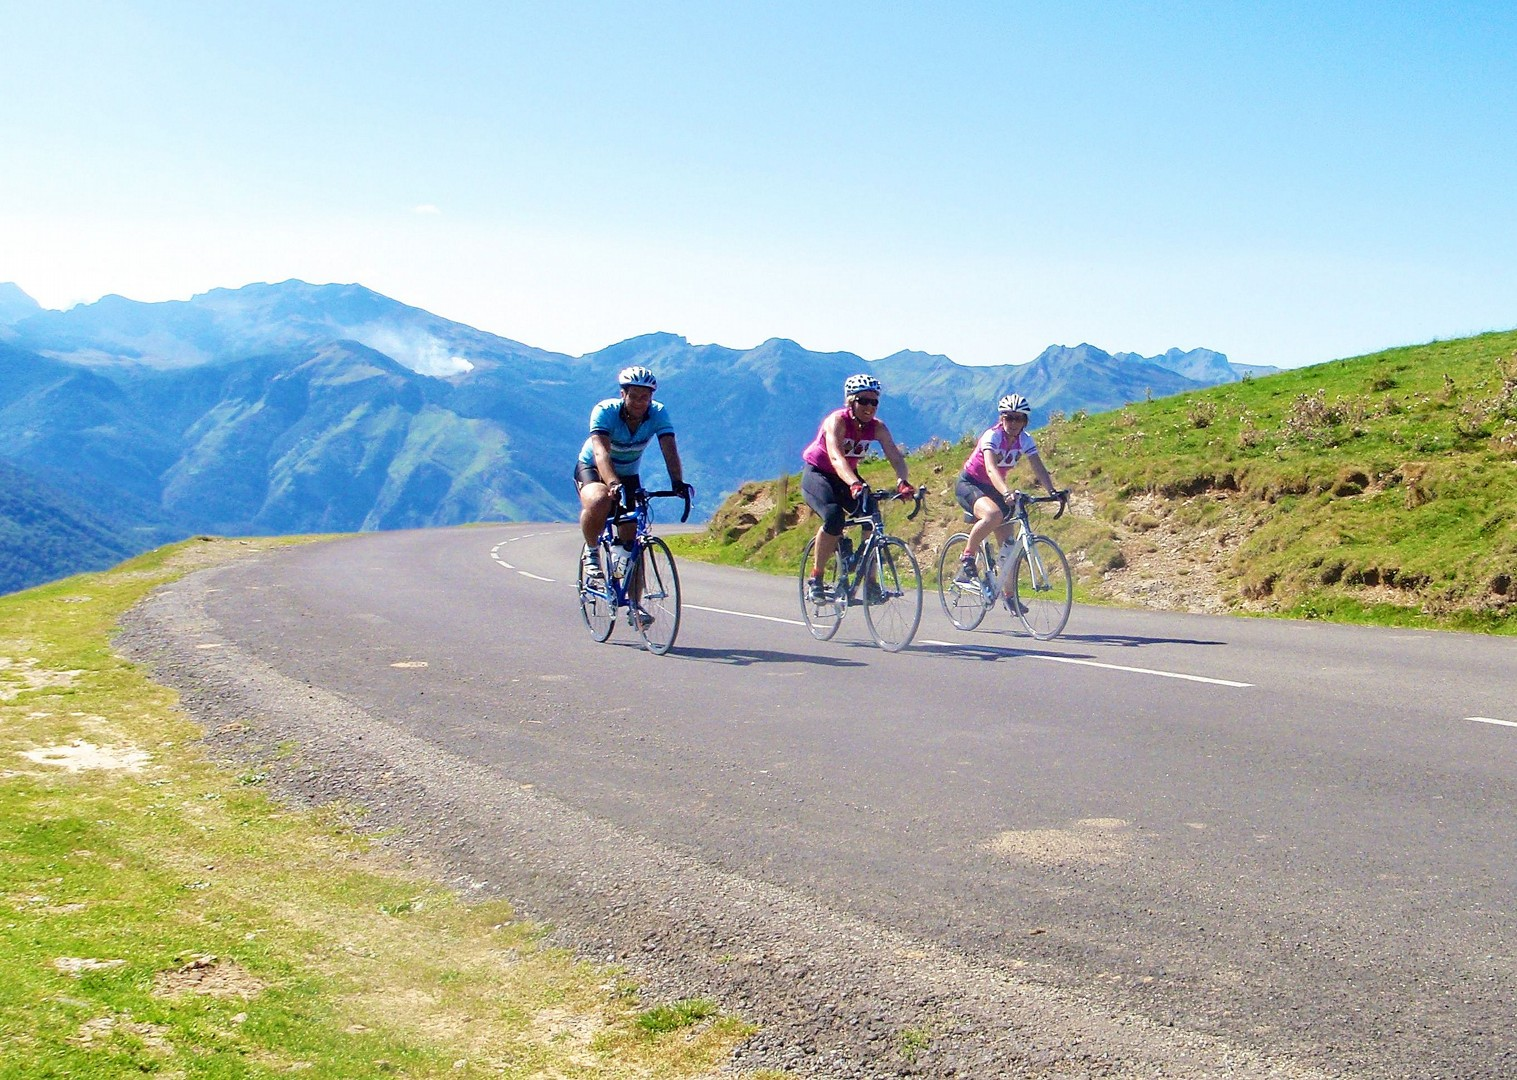 group-cycling-fitness-week-france-pyrenees.jpg - France - Pyrenees Fitness Week - Guided Road Cycling Holiday (Grade 3-4) - Road Cycling